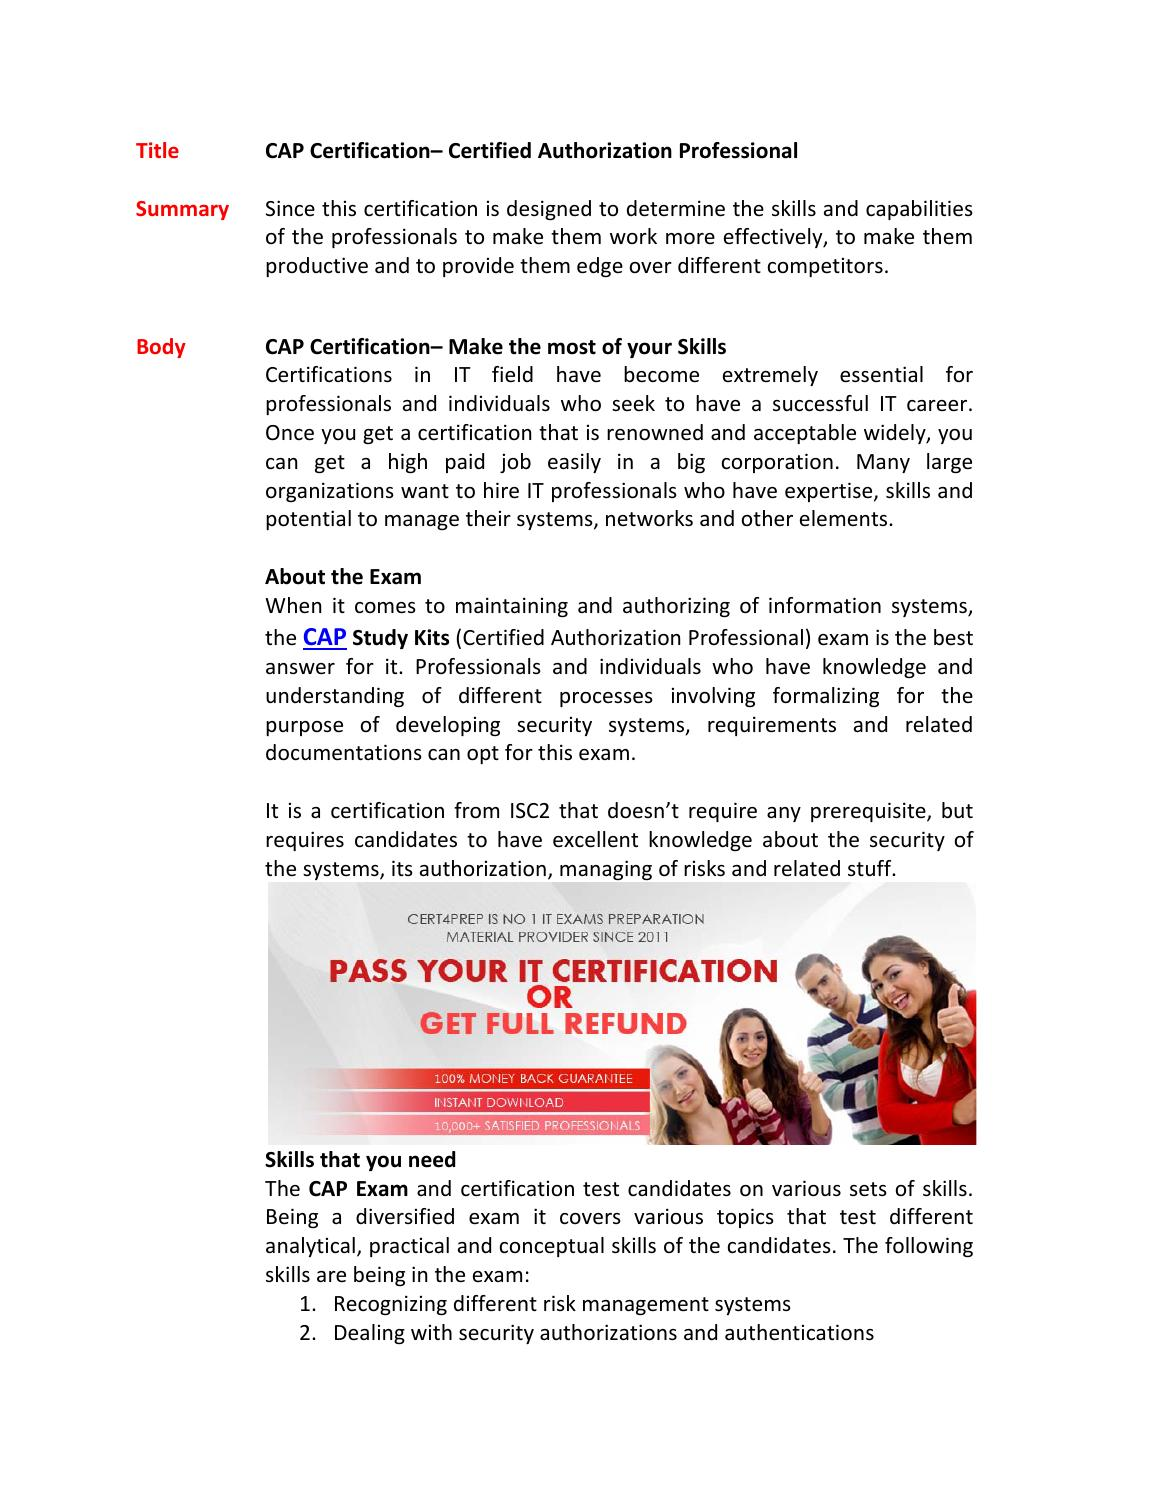 ccfebc5f908 Cap study material by Jessebutler - issuu